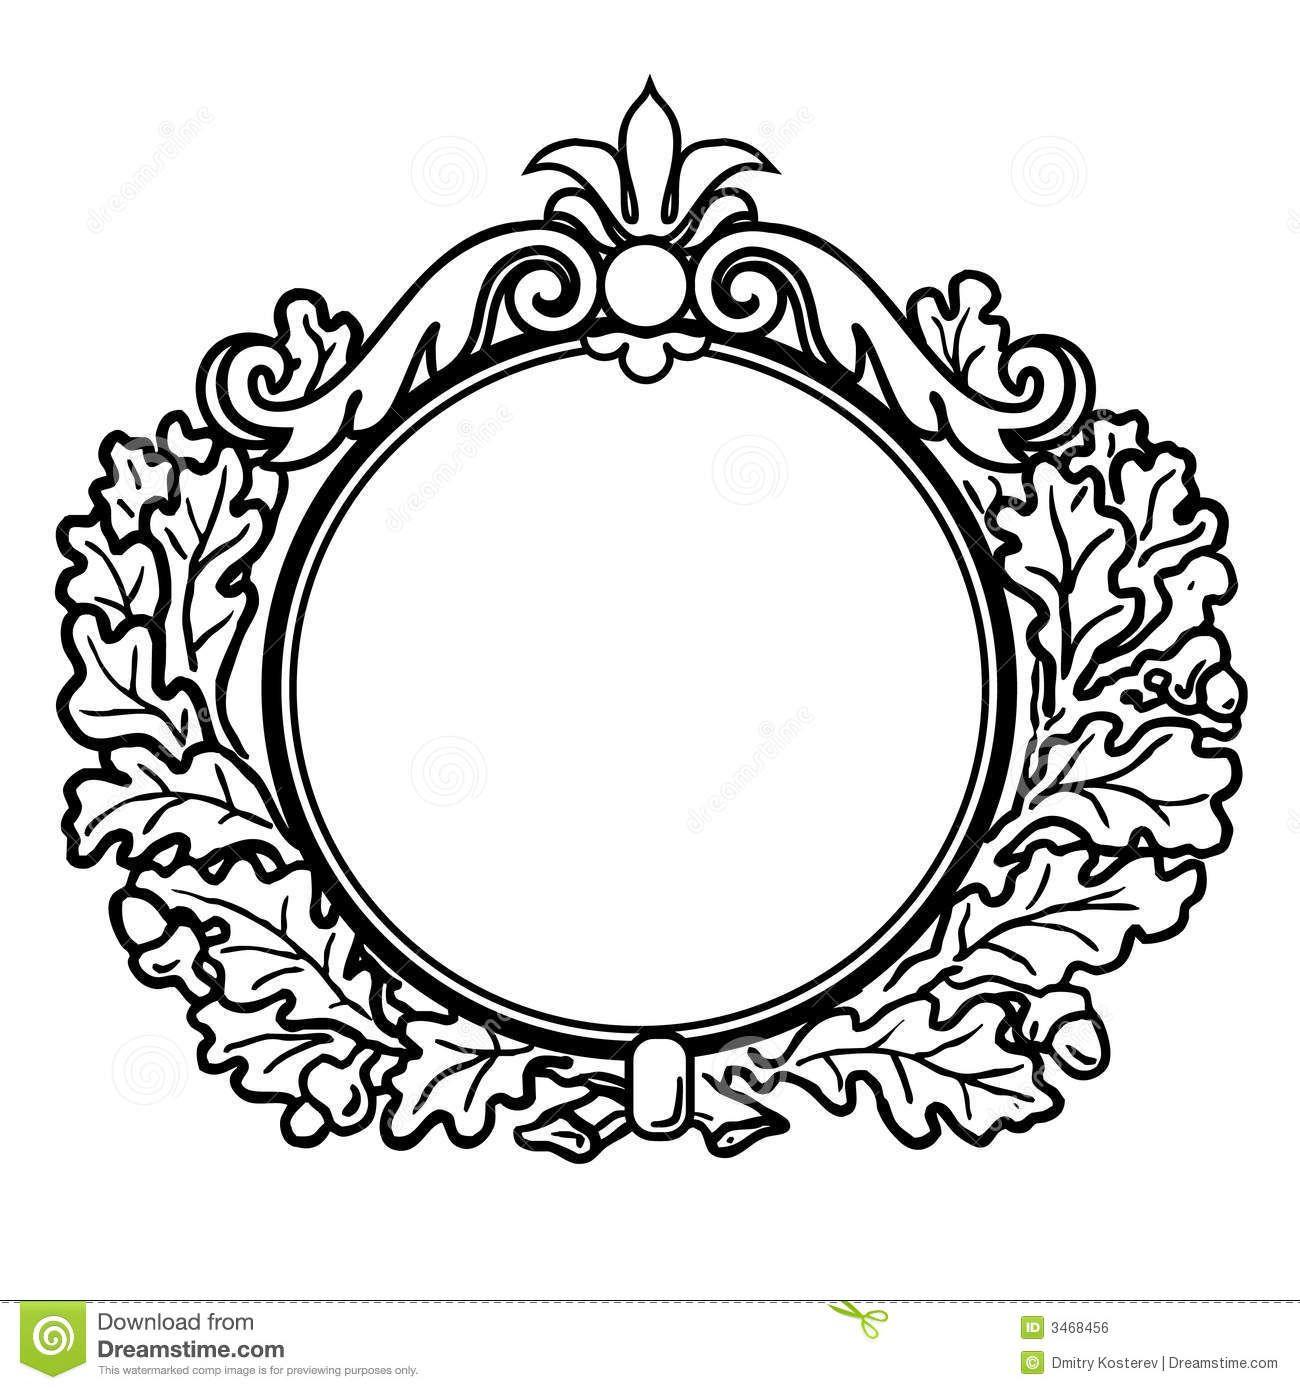 pin by d mdetallitos y manualidades on plantillas silhouette cameo rh pinterest com victorian clip art of women victorian clipart frames